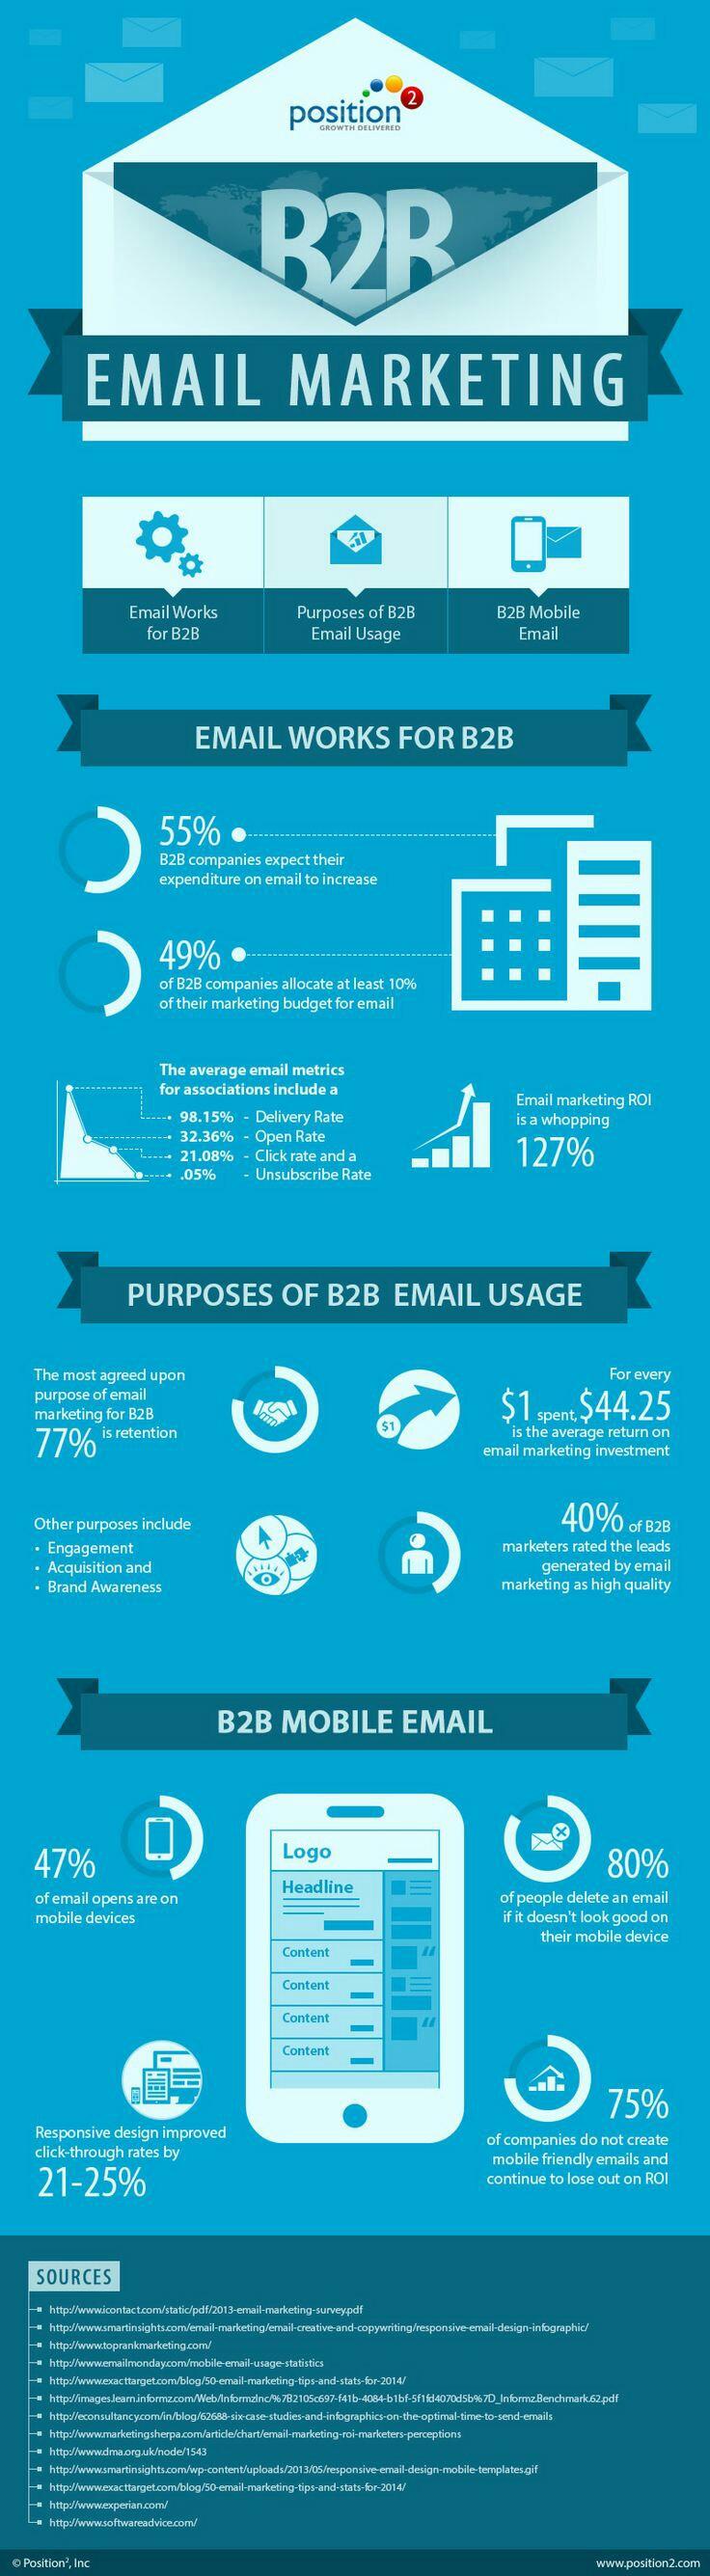 email-marketing-b2b-15-statistiques